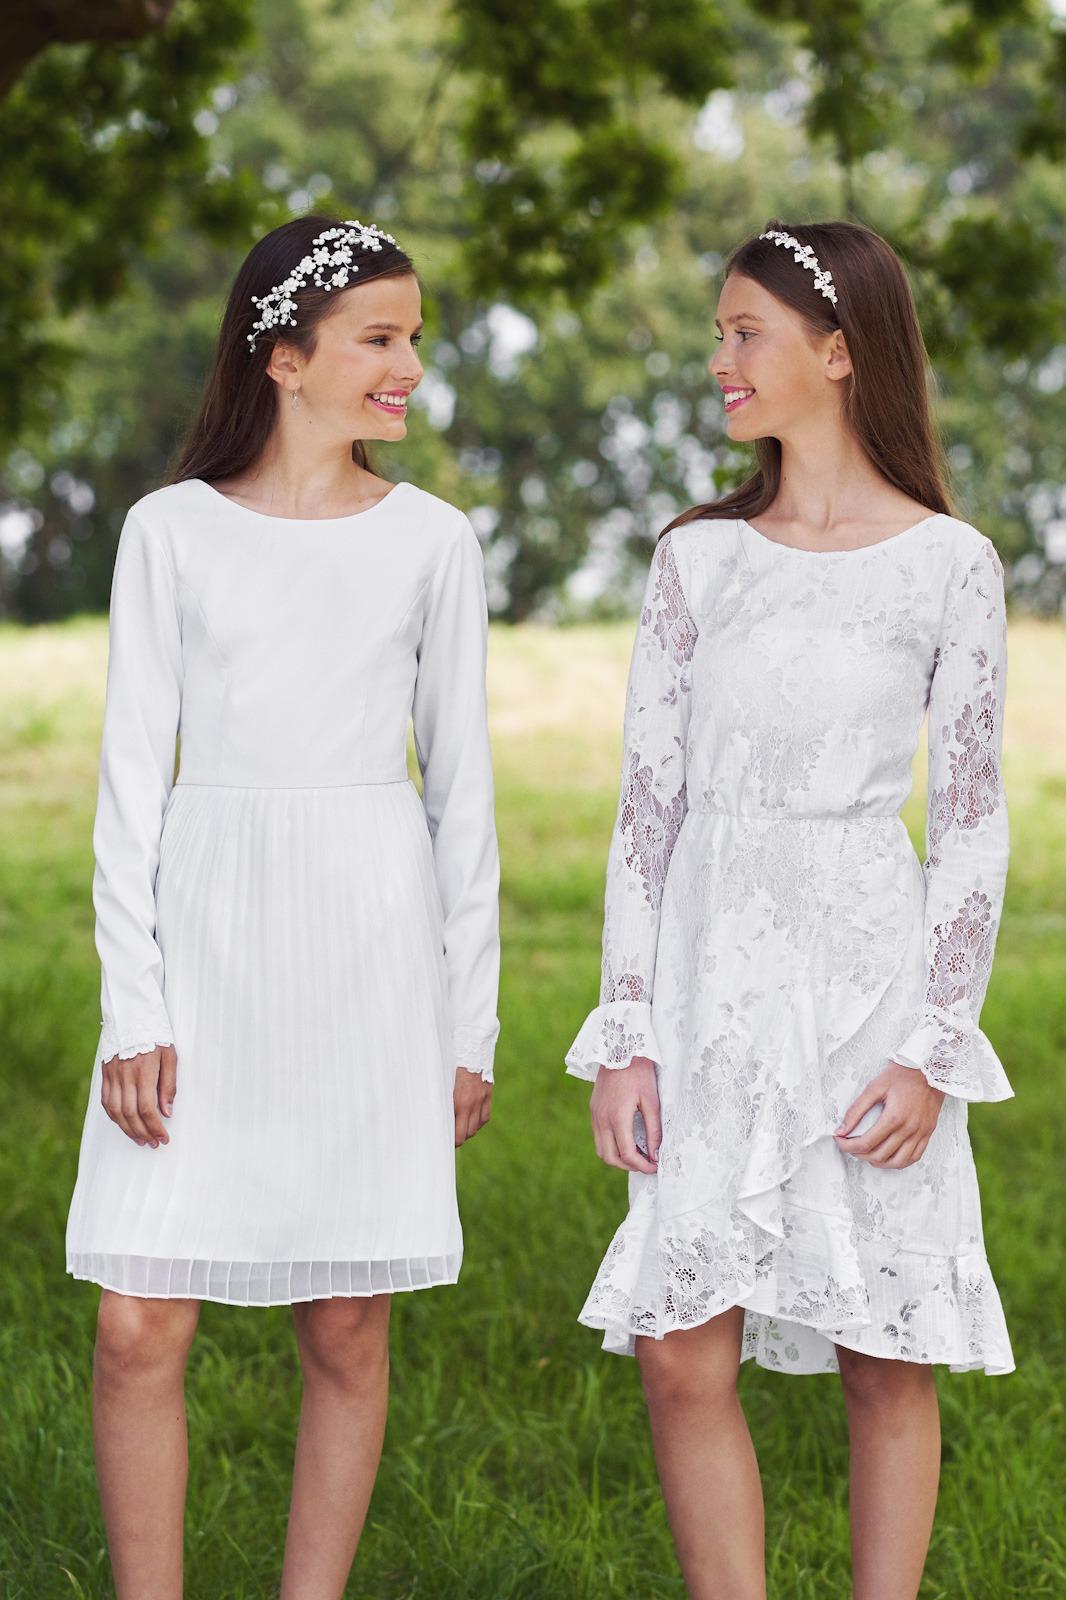 Konfirmationskjoler med blonder - Se Real Silk Nala og Ninka hos Unique Kjoler.